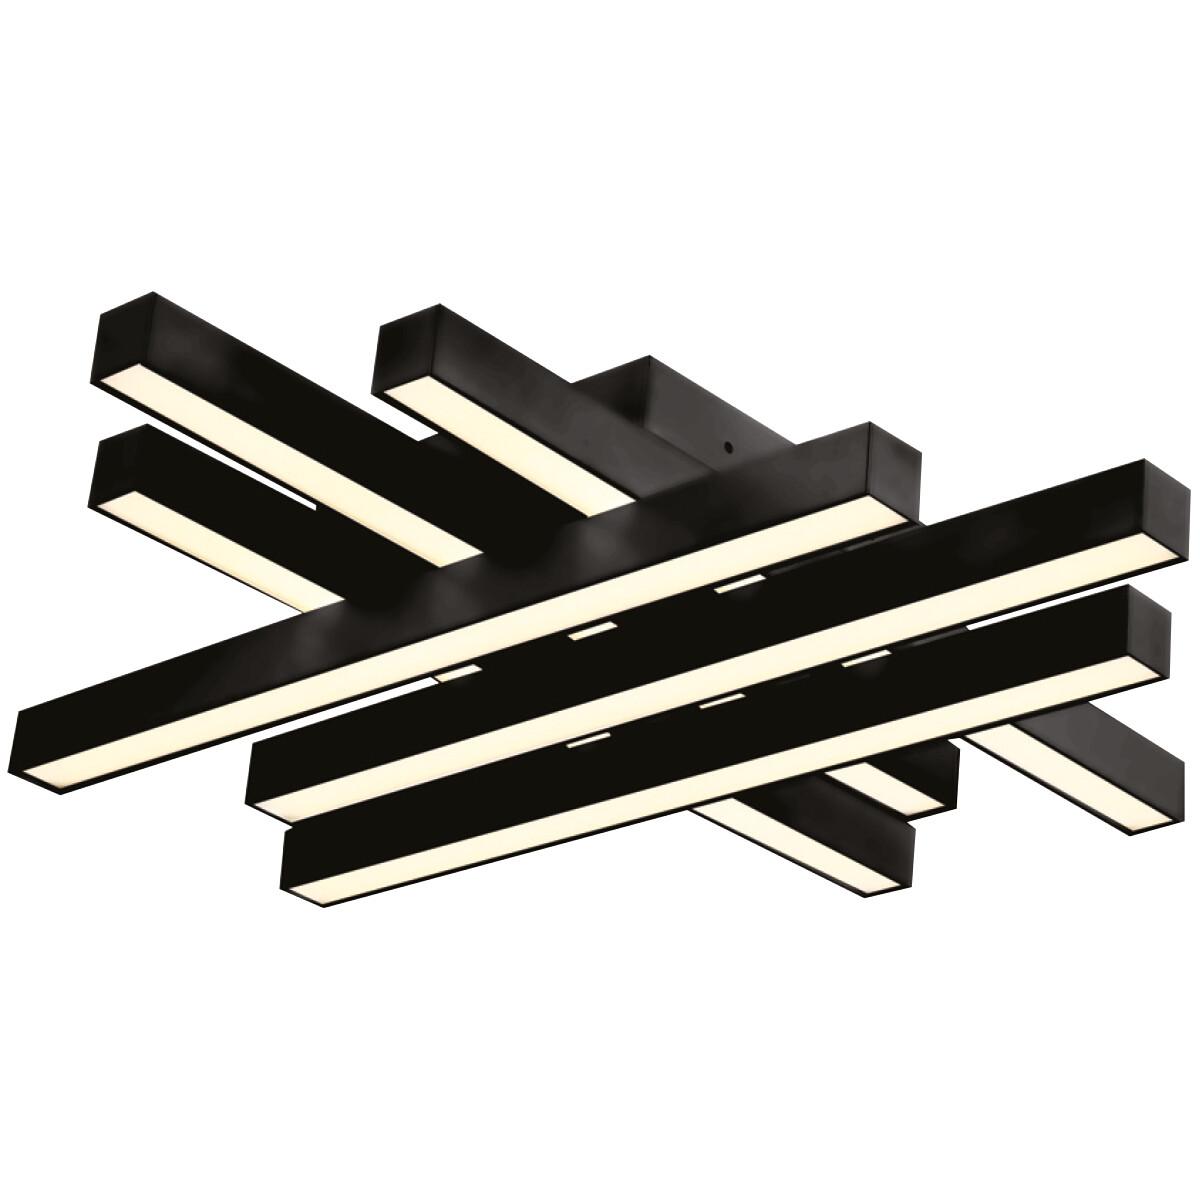 LED Plafondlamp - Plafondverlichting - Trendy - 50W - Natuurlijk Wit 4000K - Zwart Aluminium